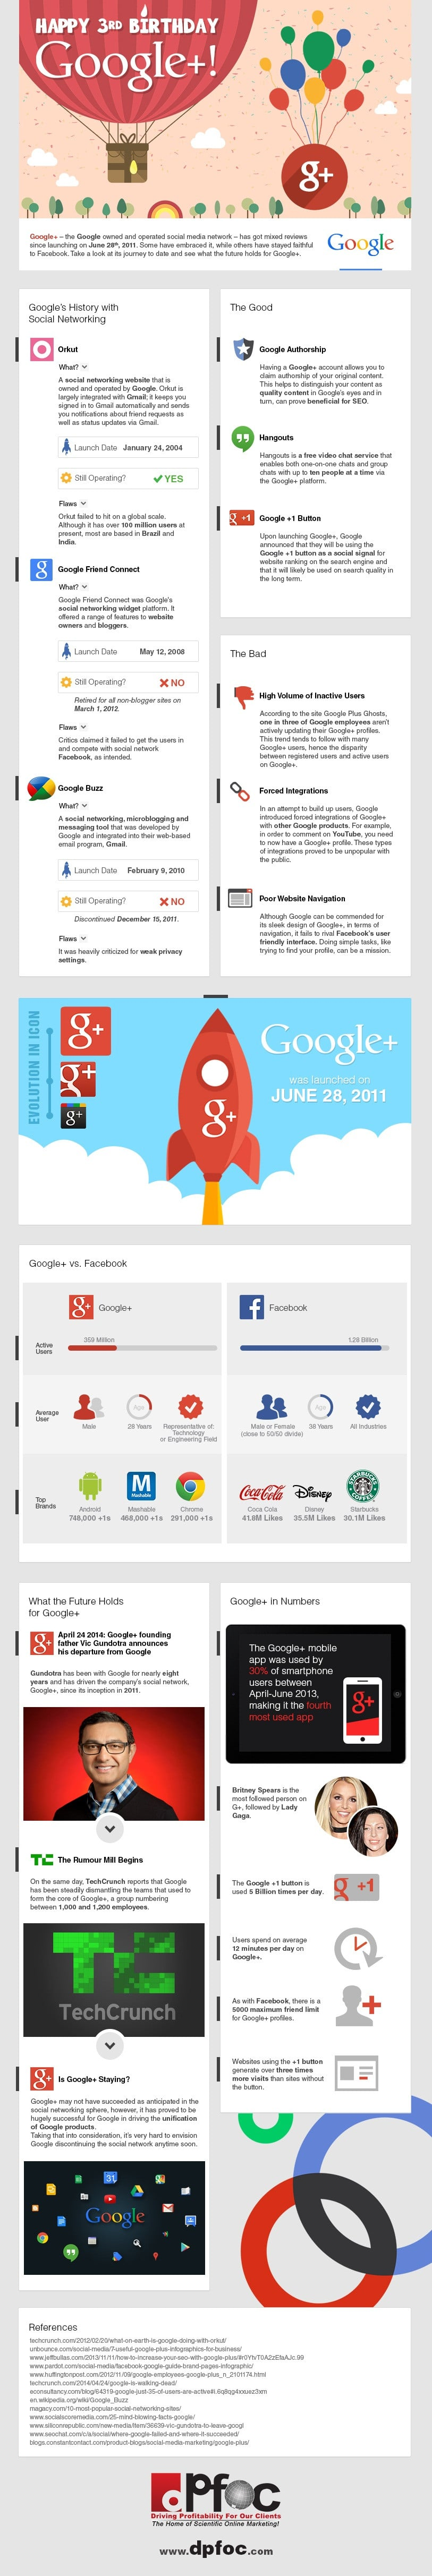 Google+ 2nd Most Popular Social Media Site